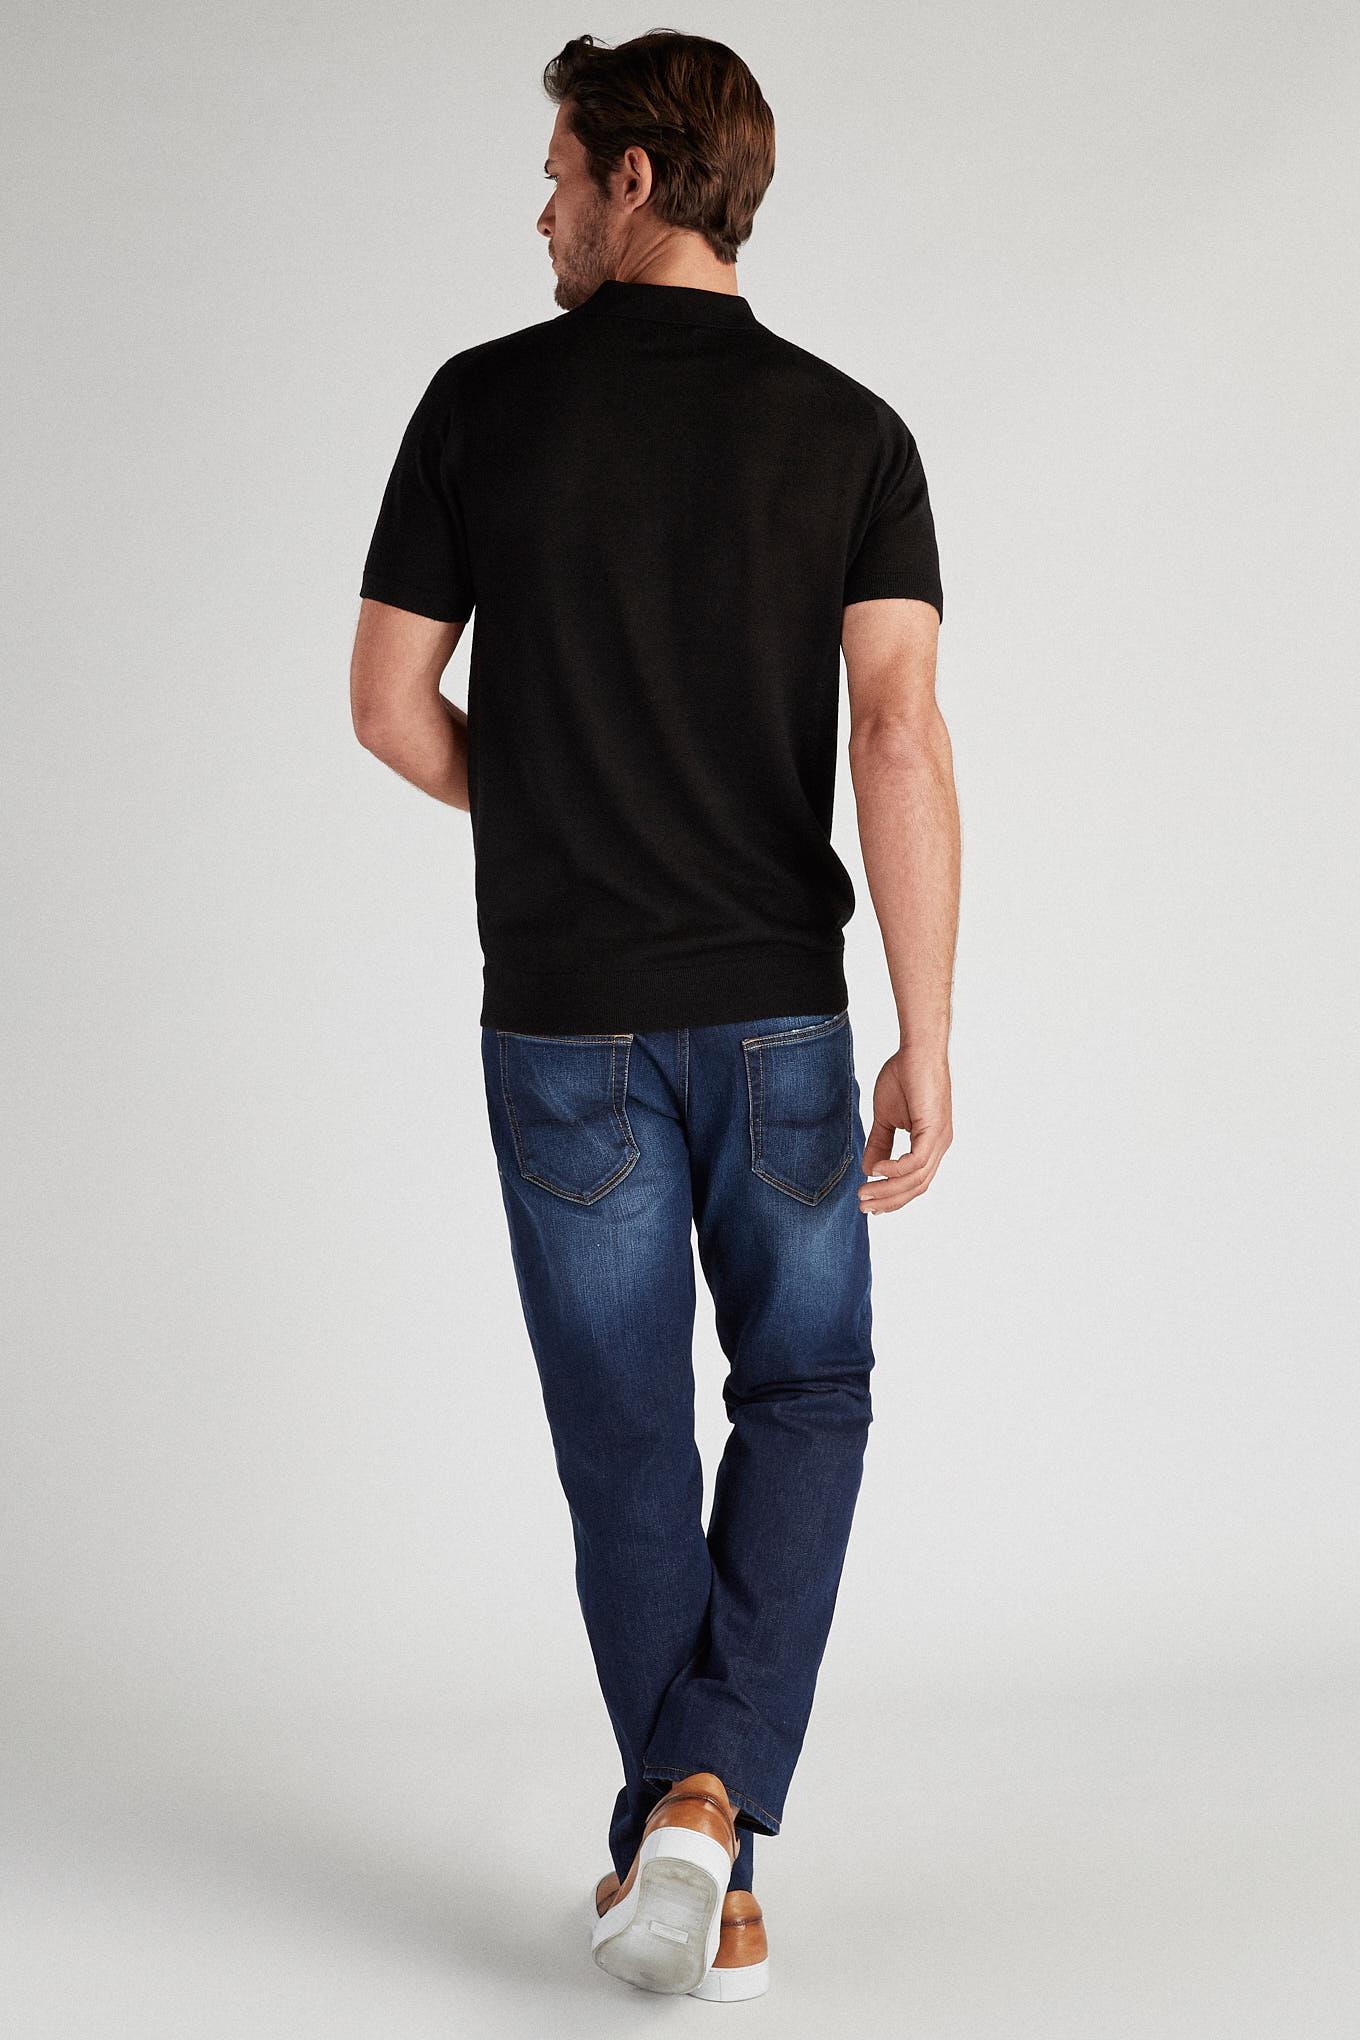 Polo Sweater Black Casual Man